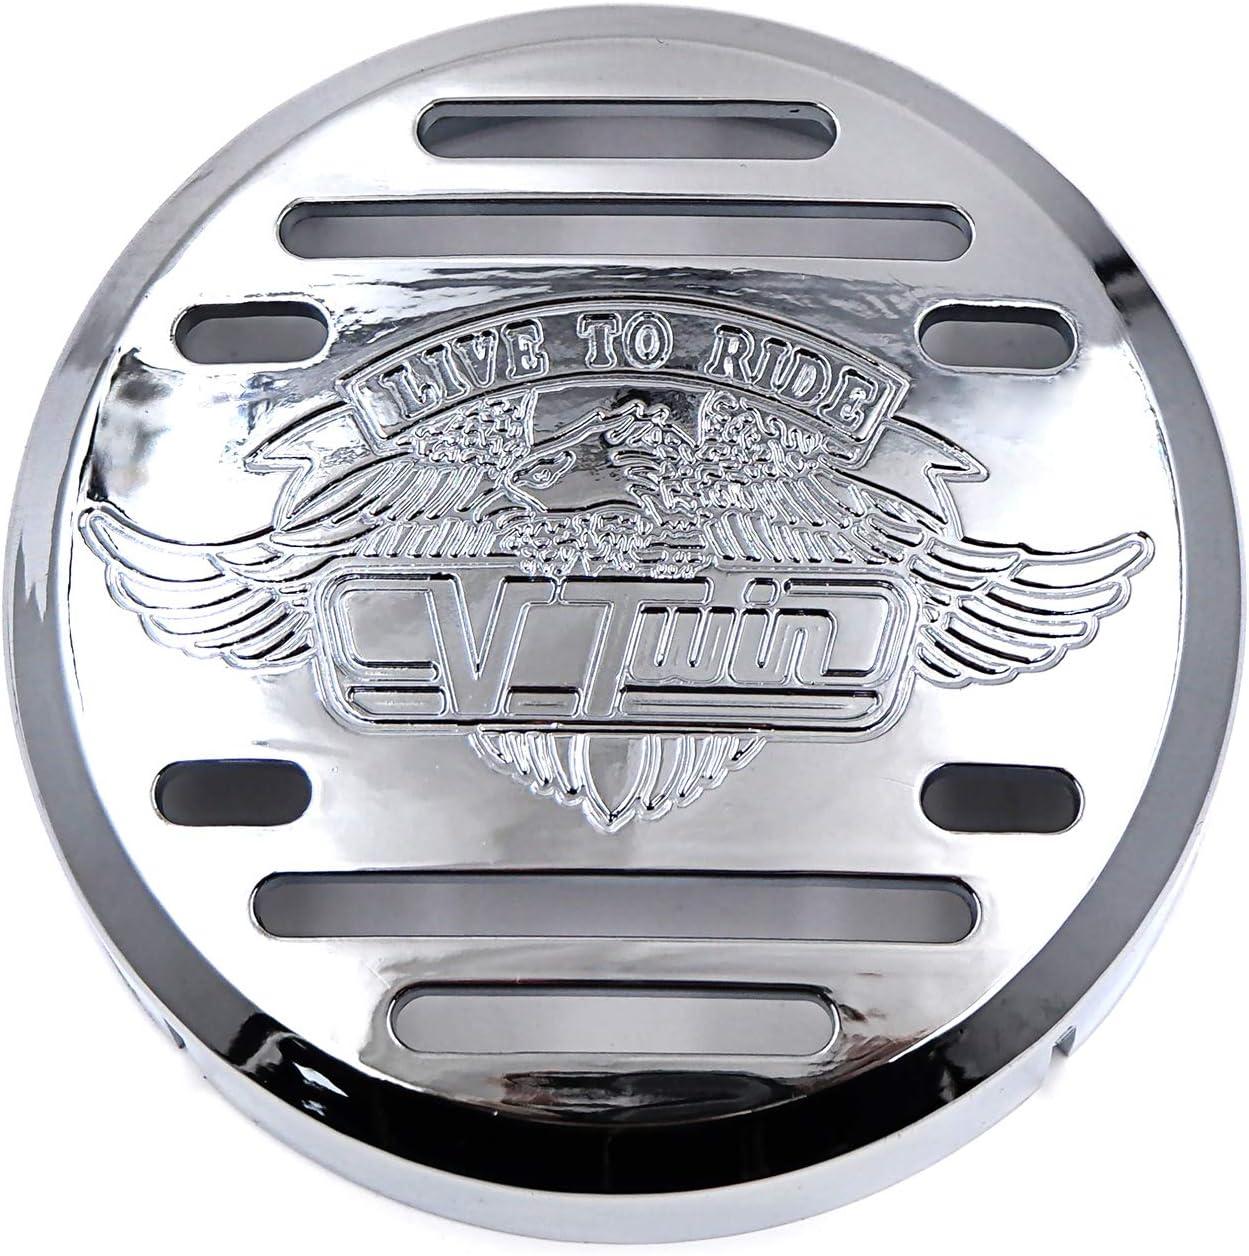 B00RUEPQIU SMT-Horn Cover Compatible with Kawasaki Vulcan 800 Yamaha V-Star 650 1100 Classic Silverado Chr